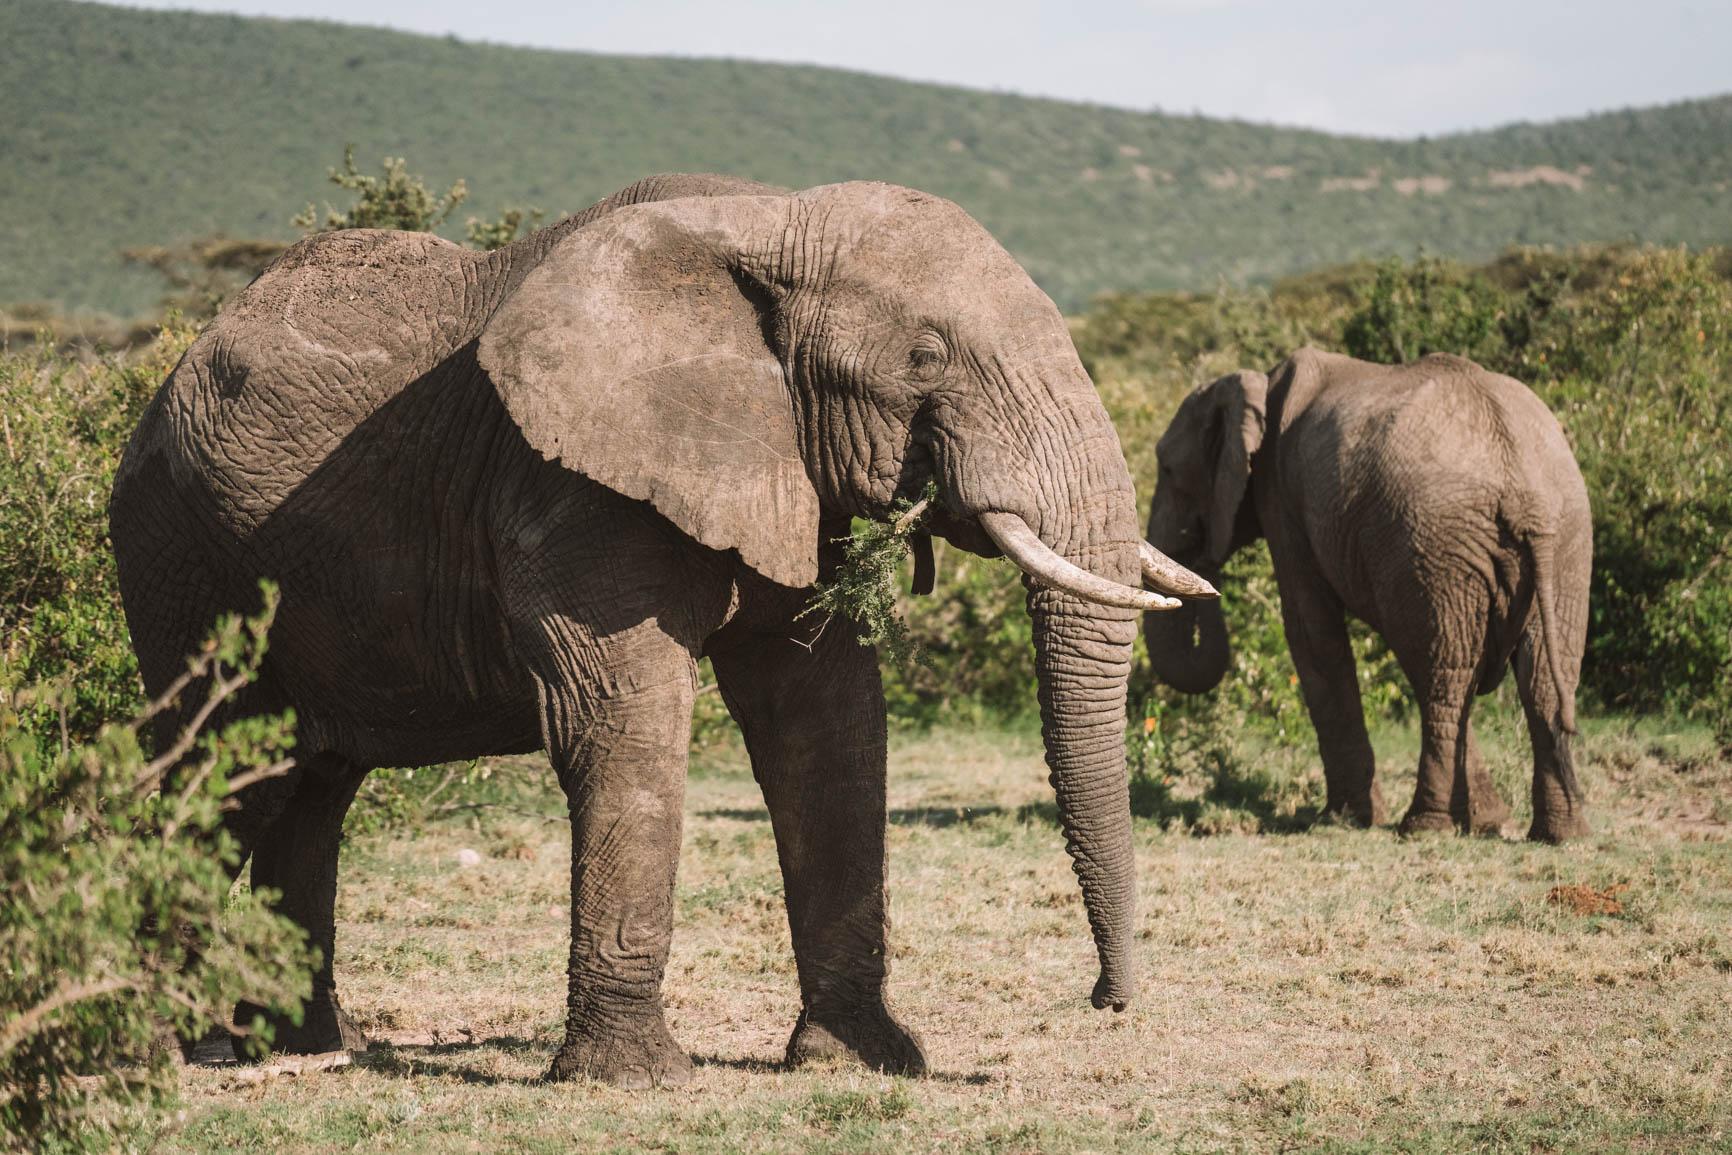 Kenya wildlife safari Luxury lodge Maasai Mara Kenya Africa #Safari #Kenya